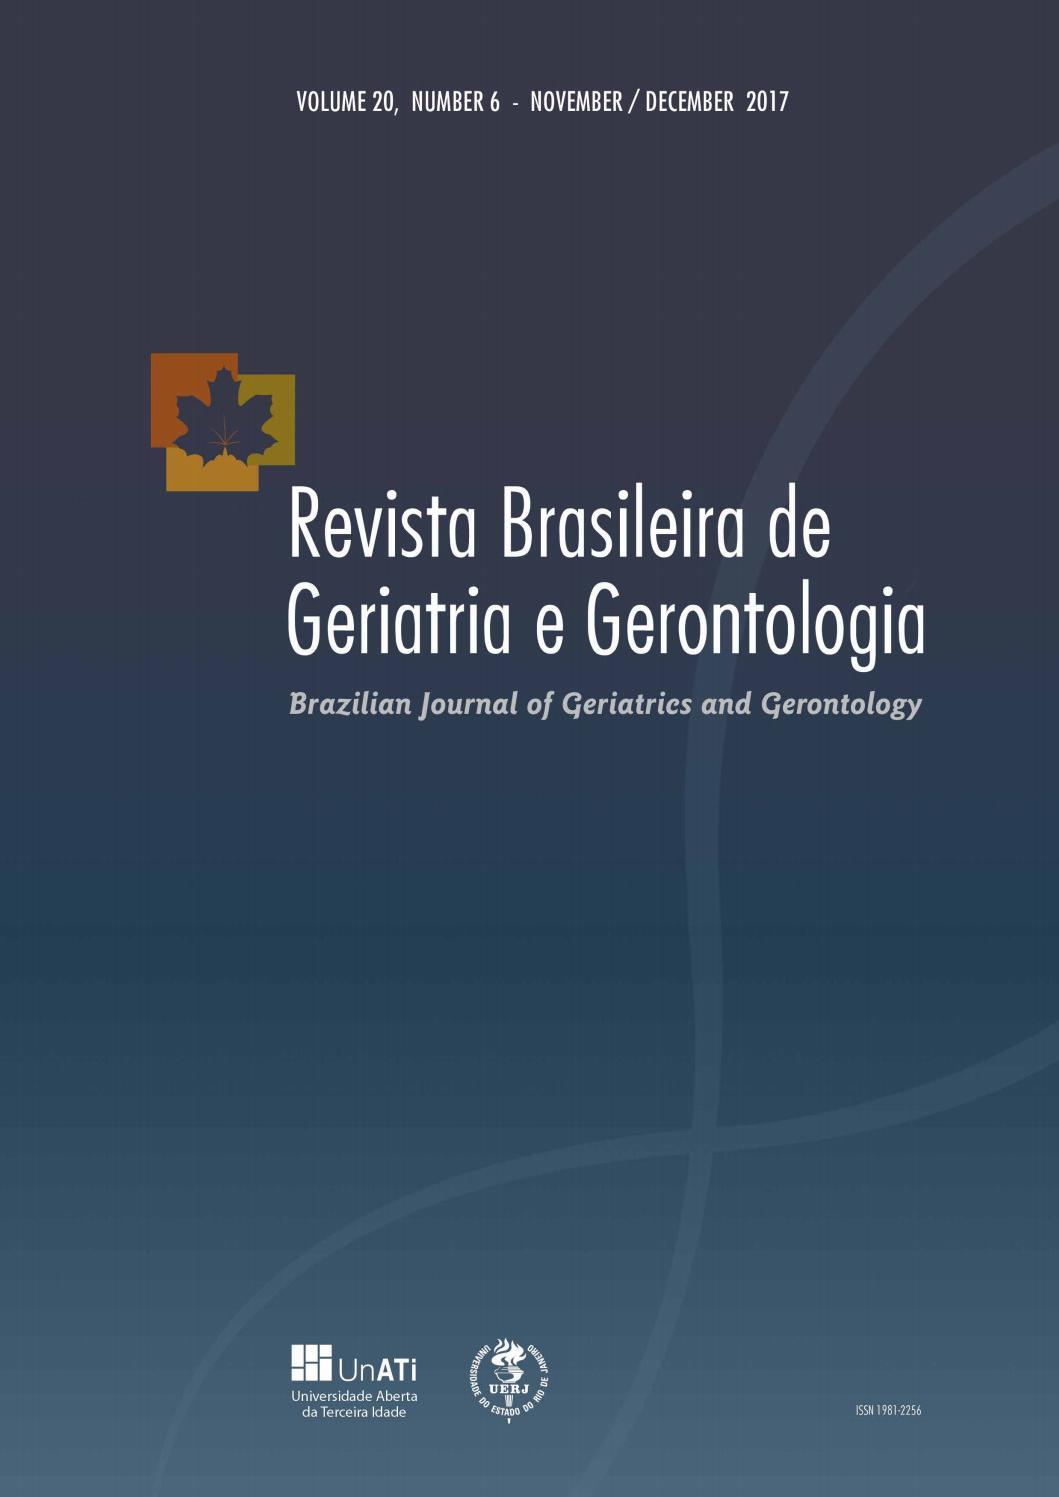 RBGG Vol. 20 Nº6 - November/Dezember 2017 - English by Revista ...